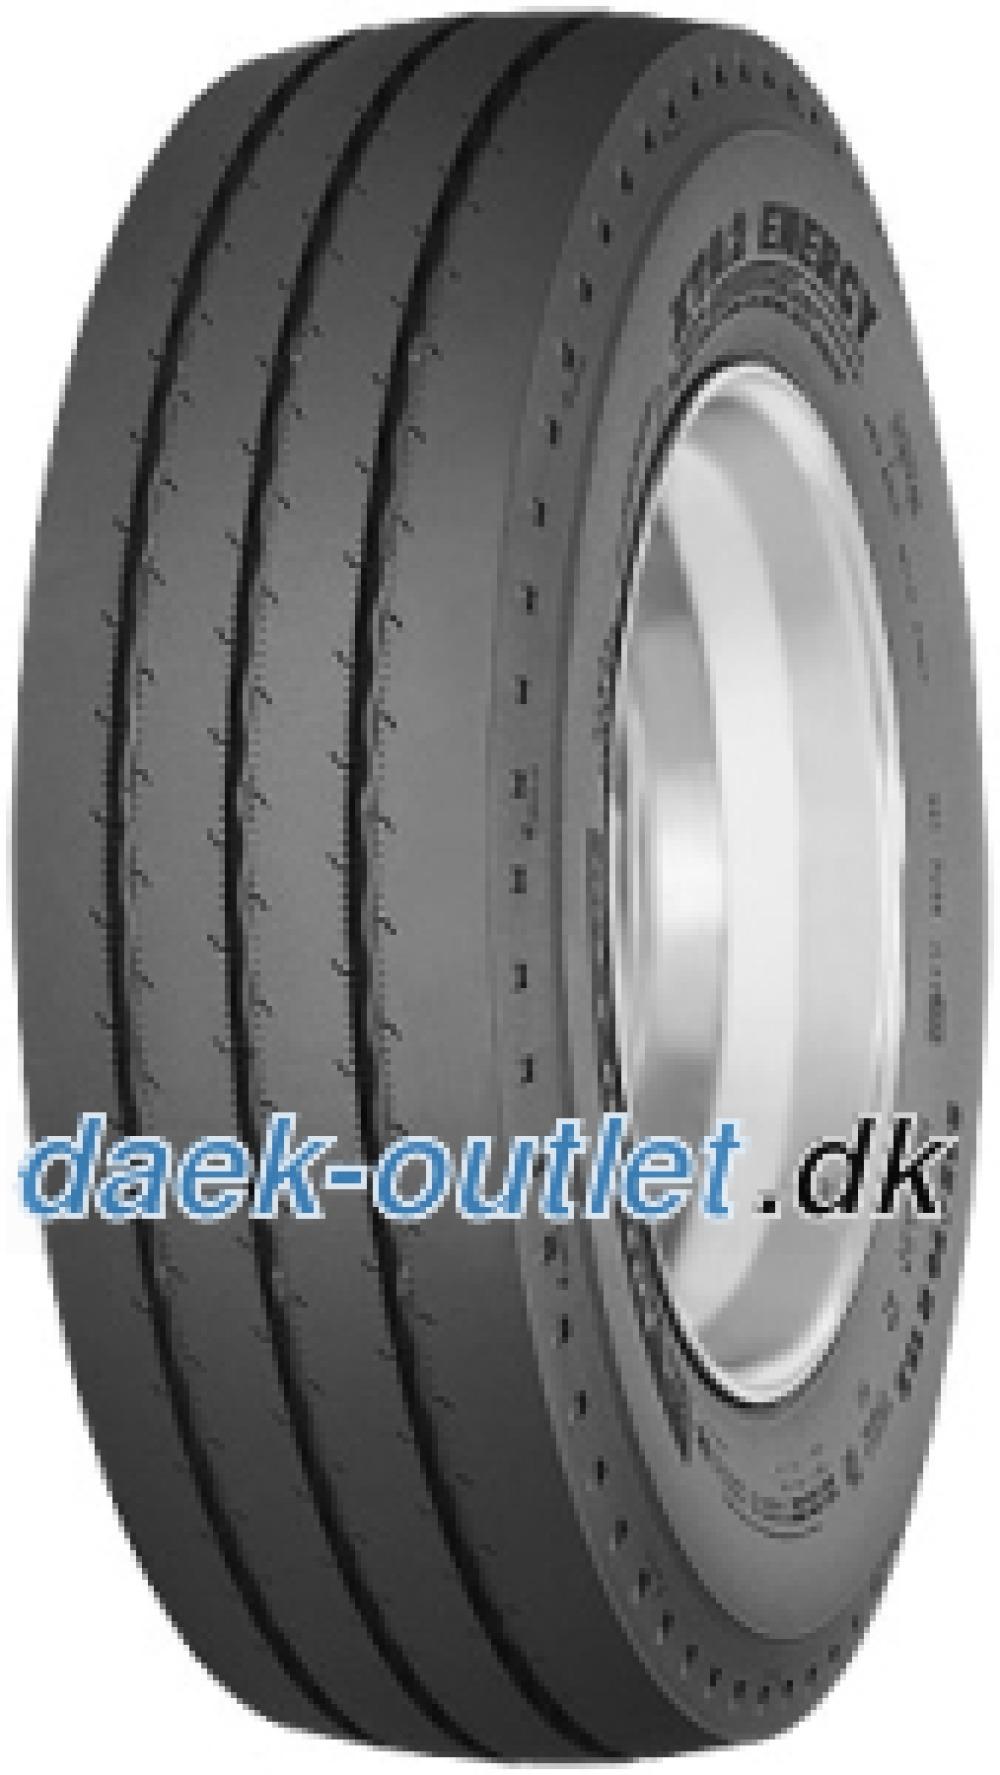 Michelin Remix XTA 2 Energy ( 445/45 R19.5 160J totalt fornyet )